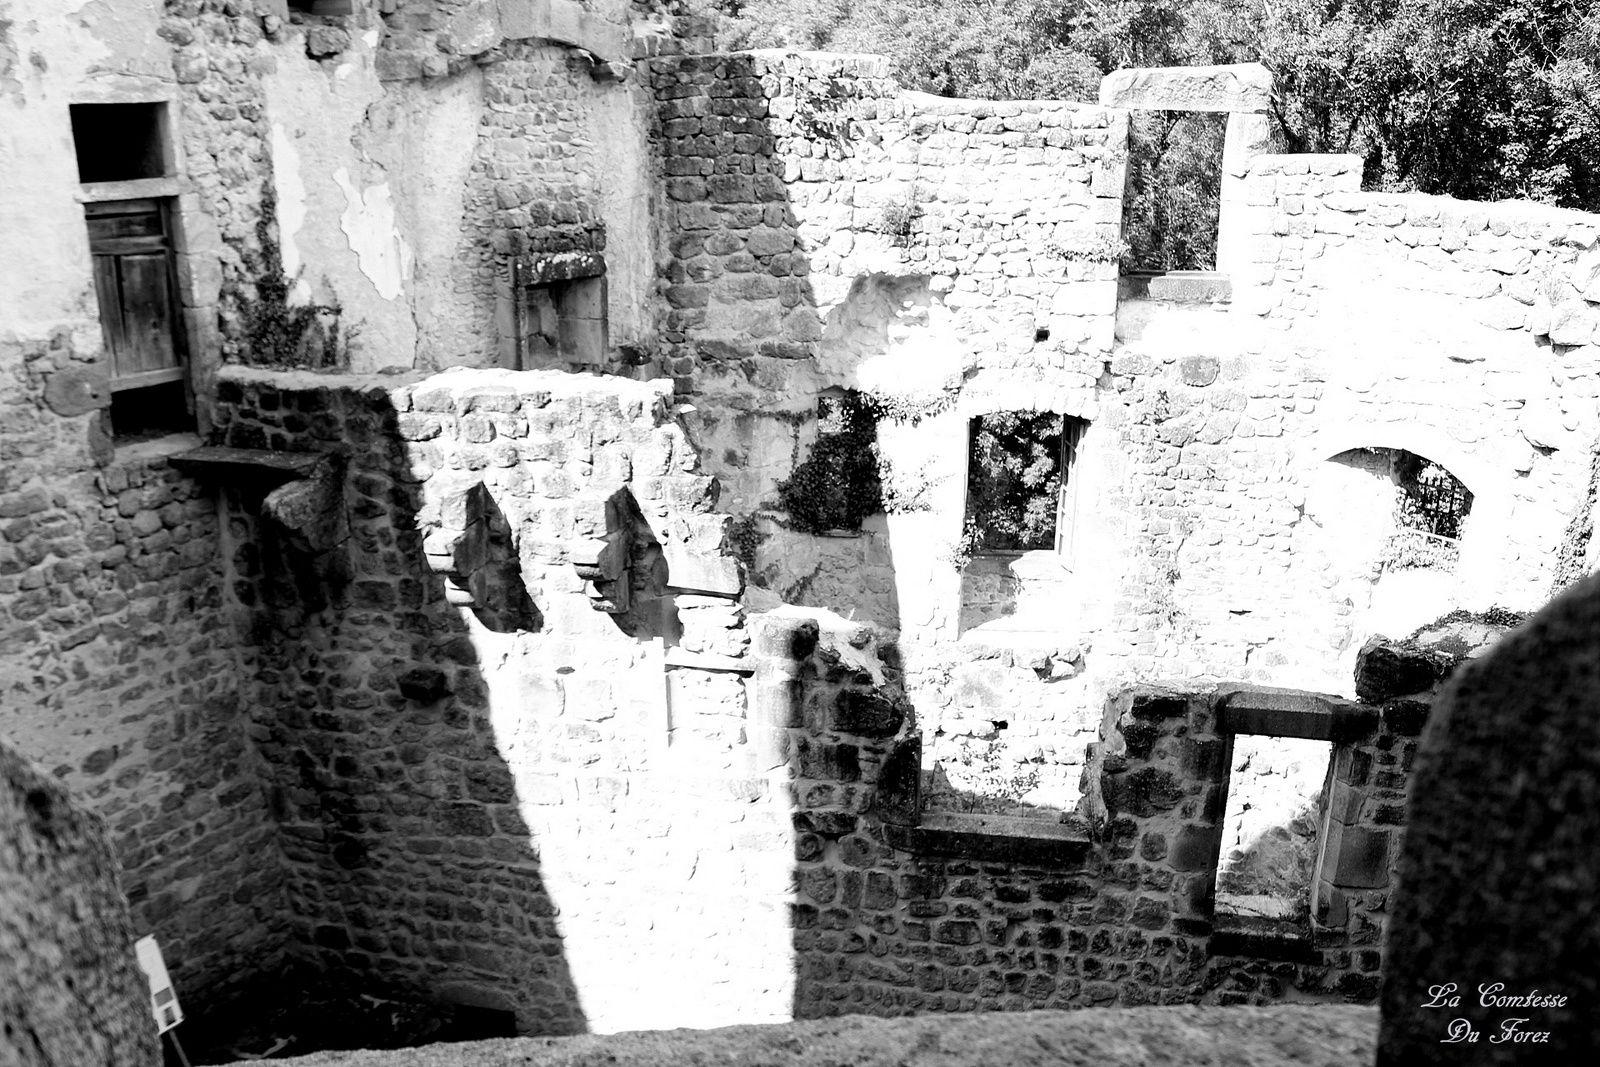 les ruines vue d'en haut